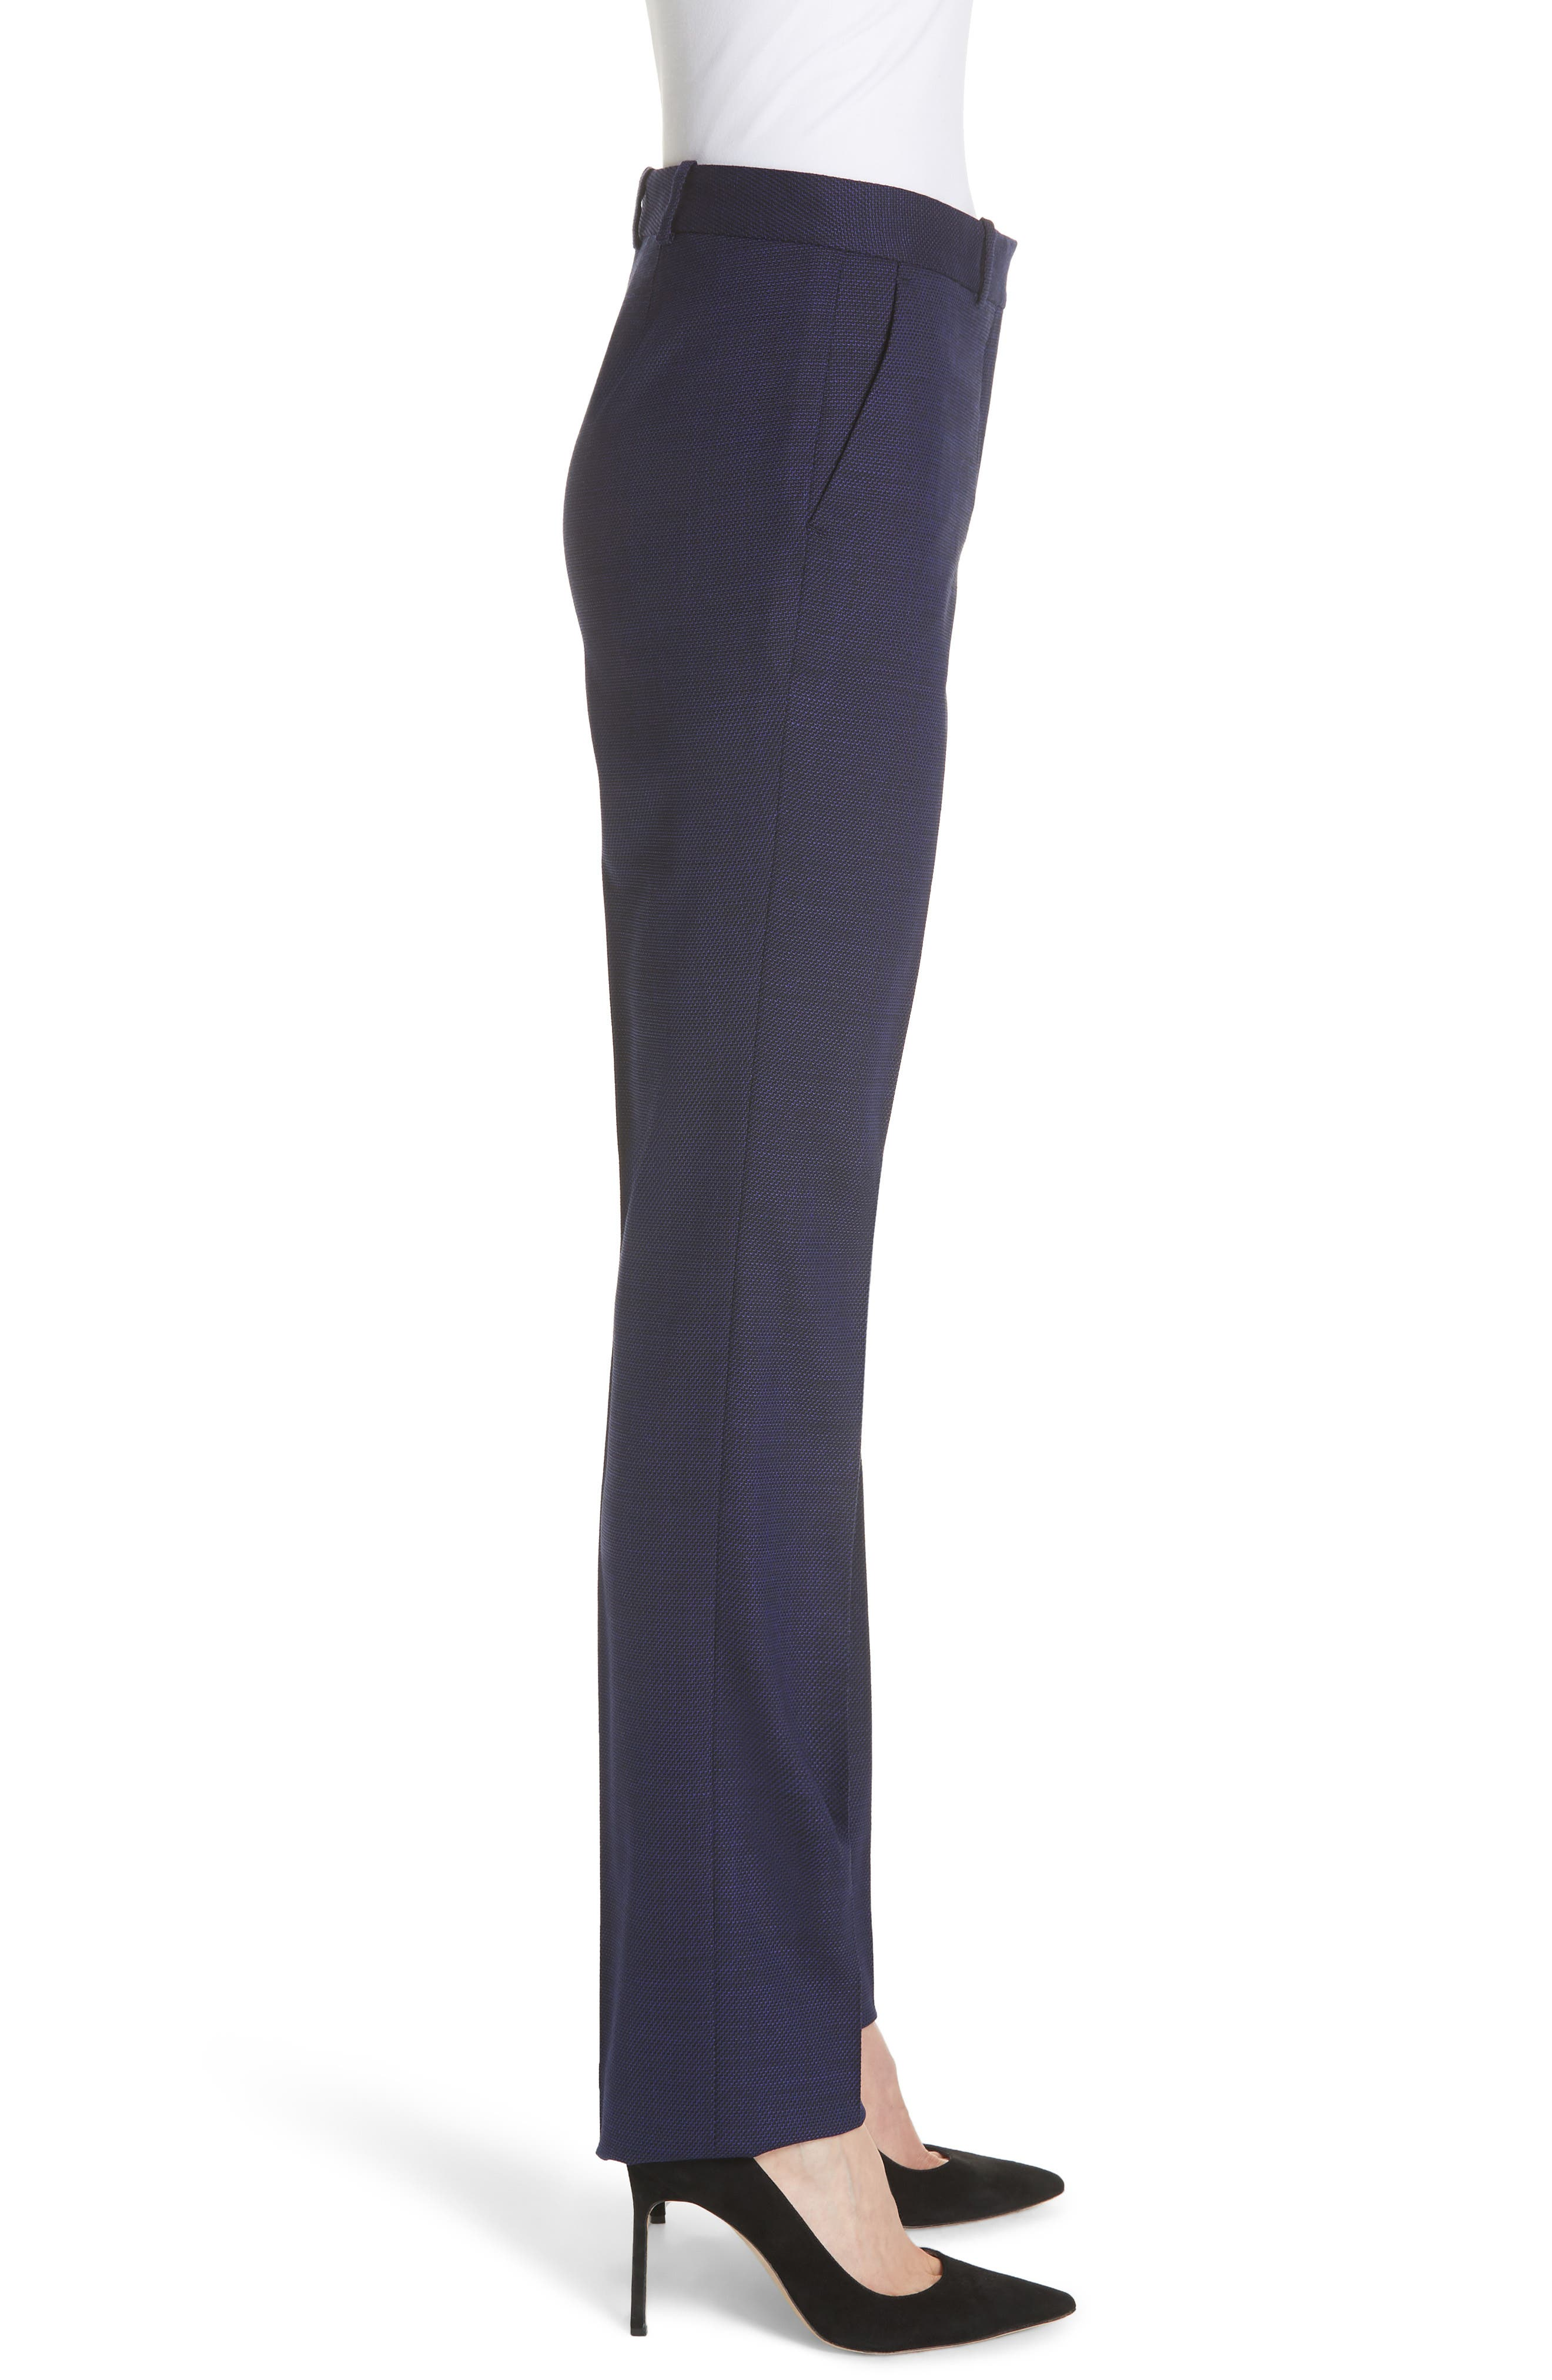 Titana Mini Glencheck Straight Leg Suit Pants,                             Alternate thumbnail 3, color,                             Deep Lilac Fantasy